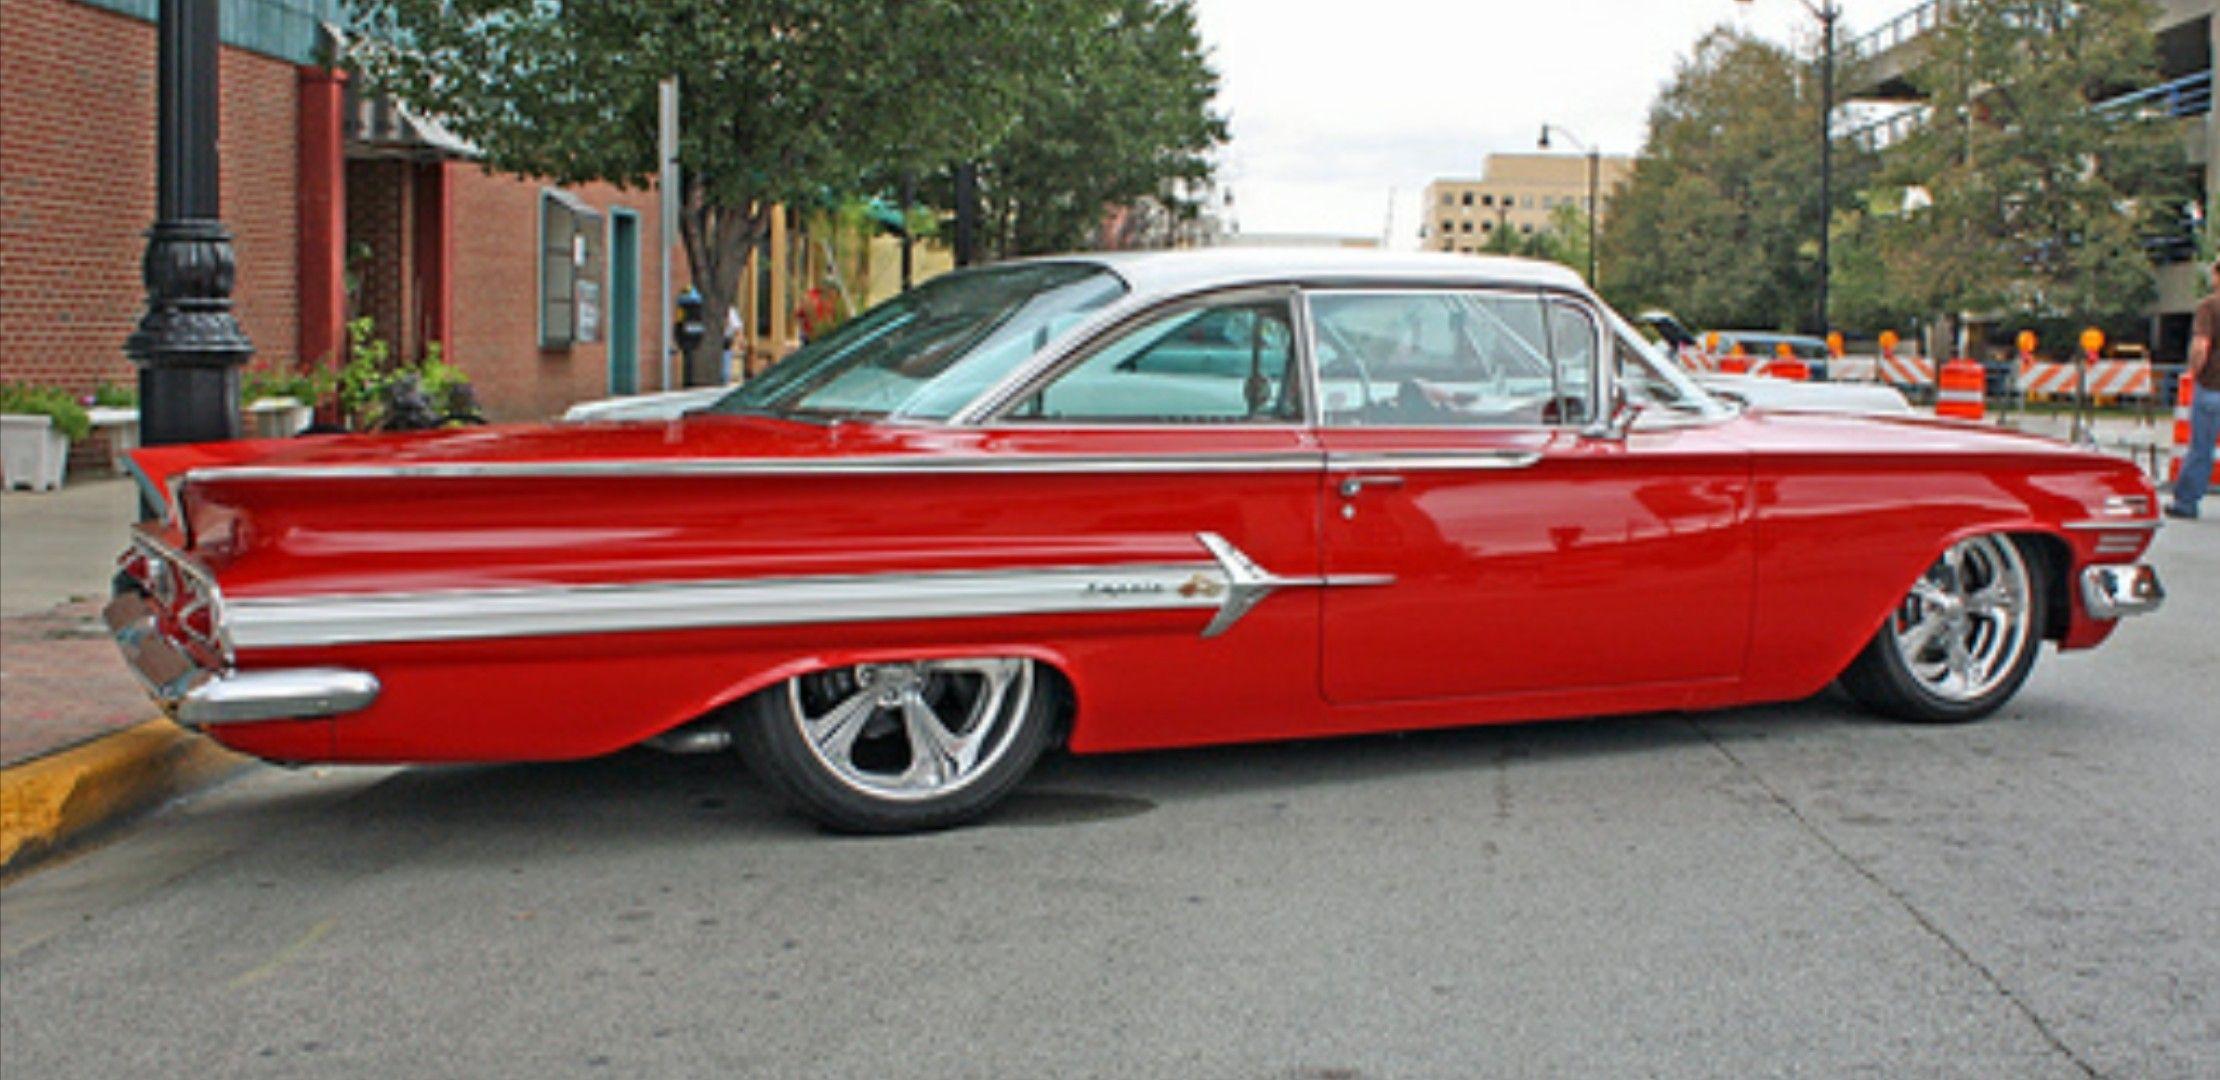 59 Impala | Classic American Cars | Pinterest | Cars, Bel air and ...